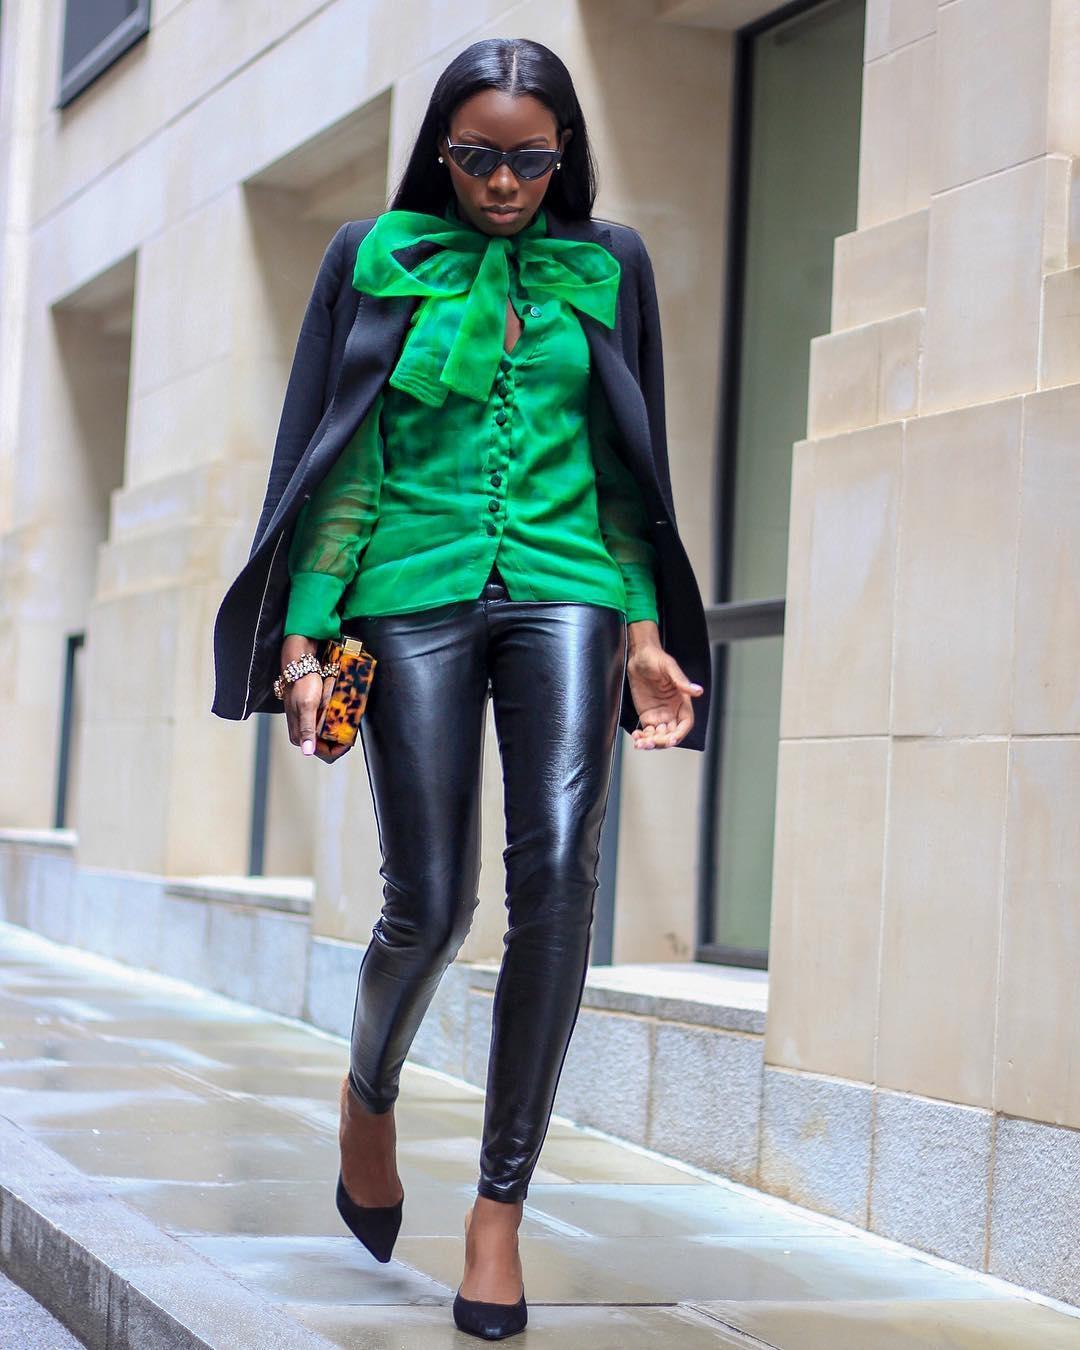 ama-godson-green-outfit-styling